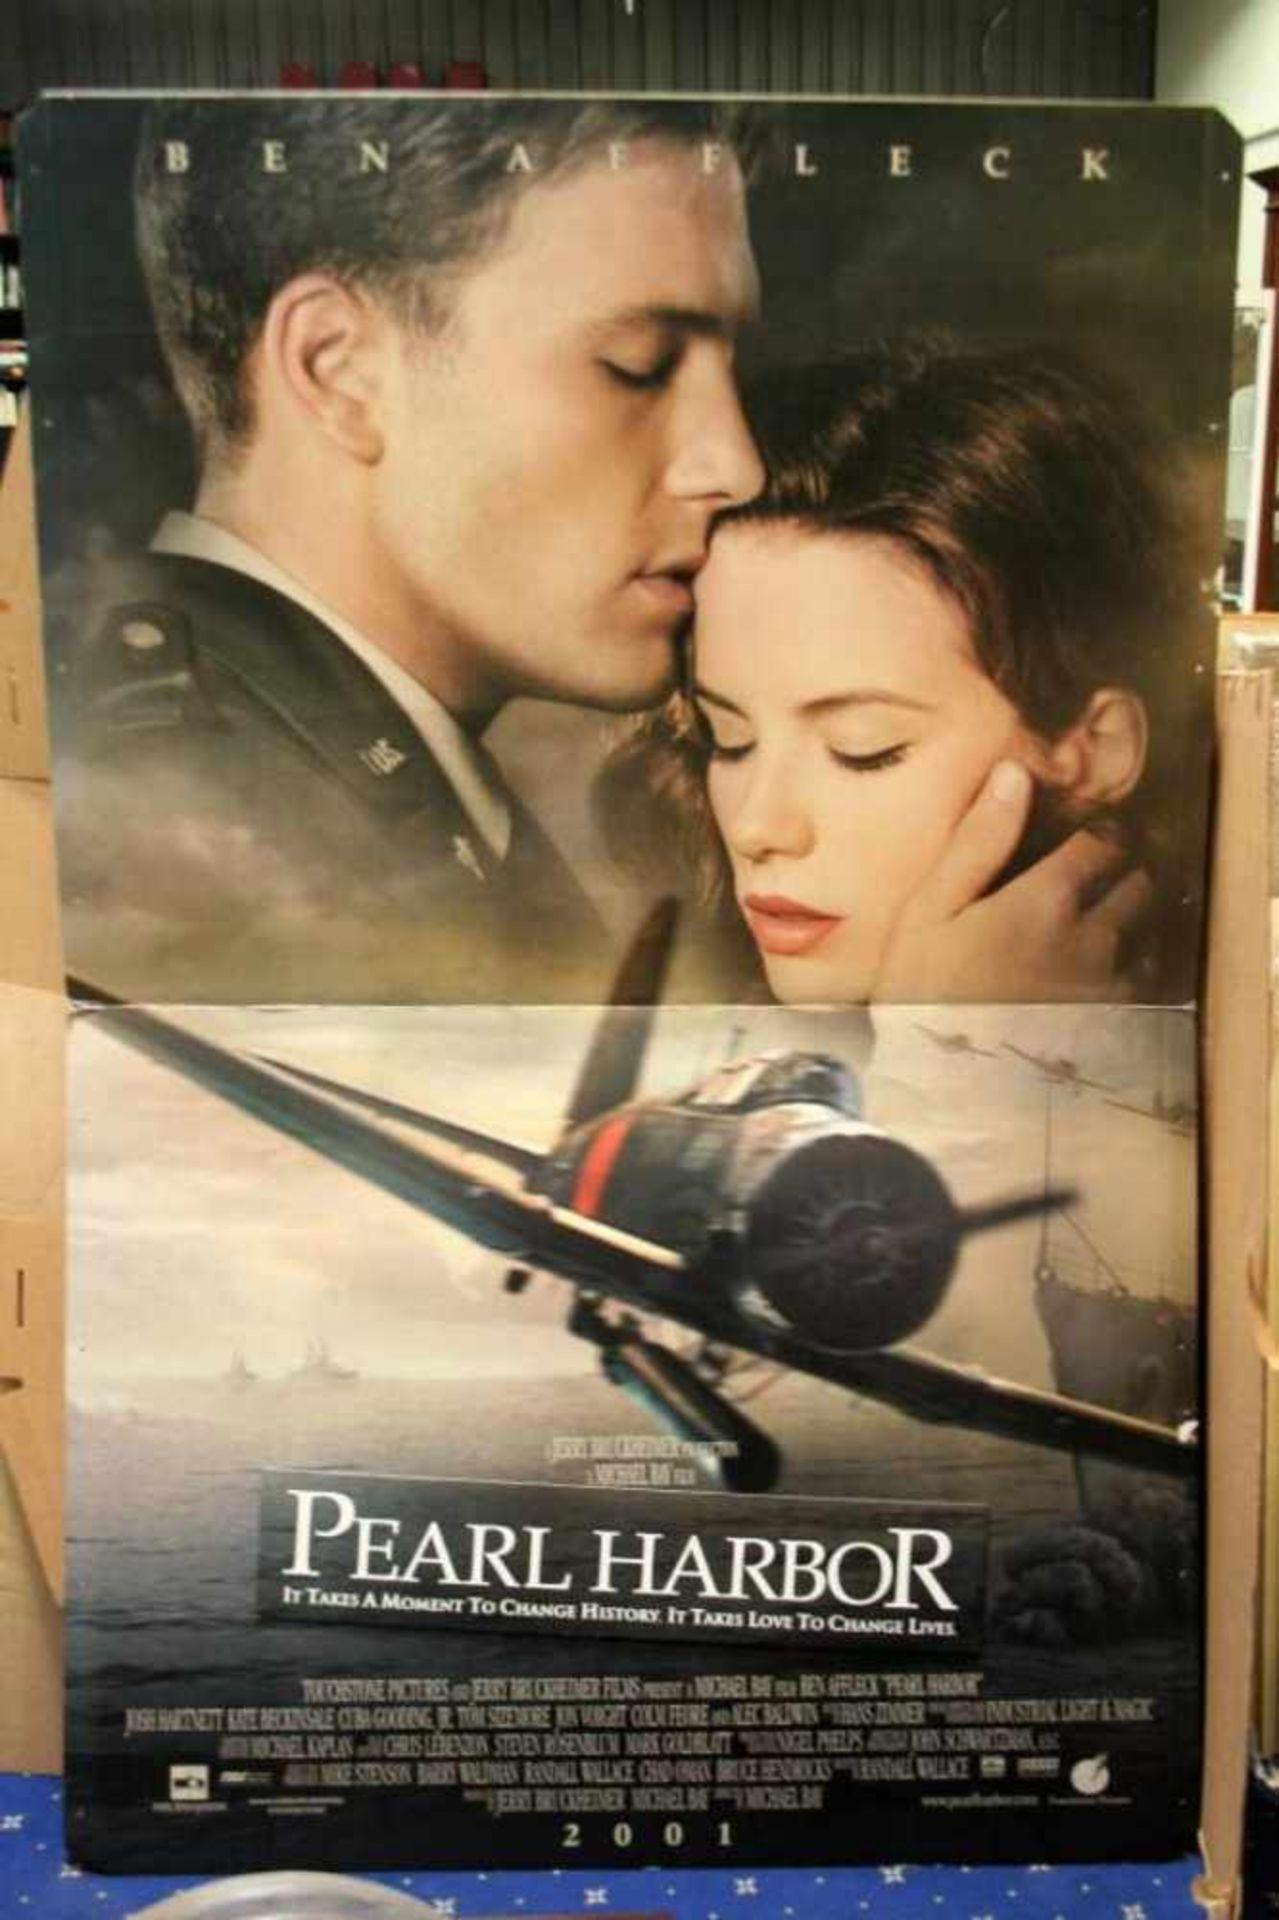 Billboard 'Pearl Harbor' Ben Affleck, 192x96 cm